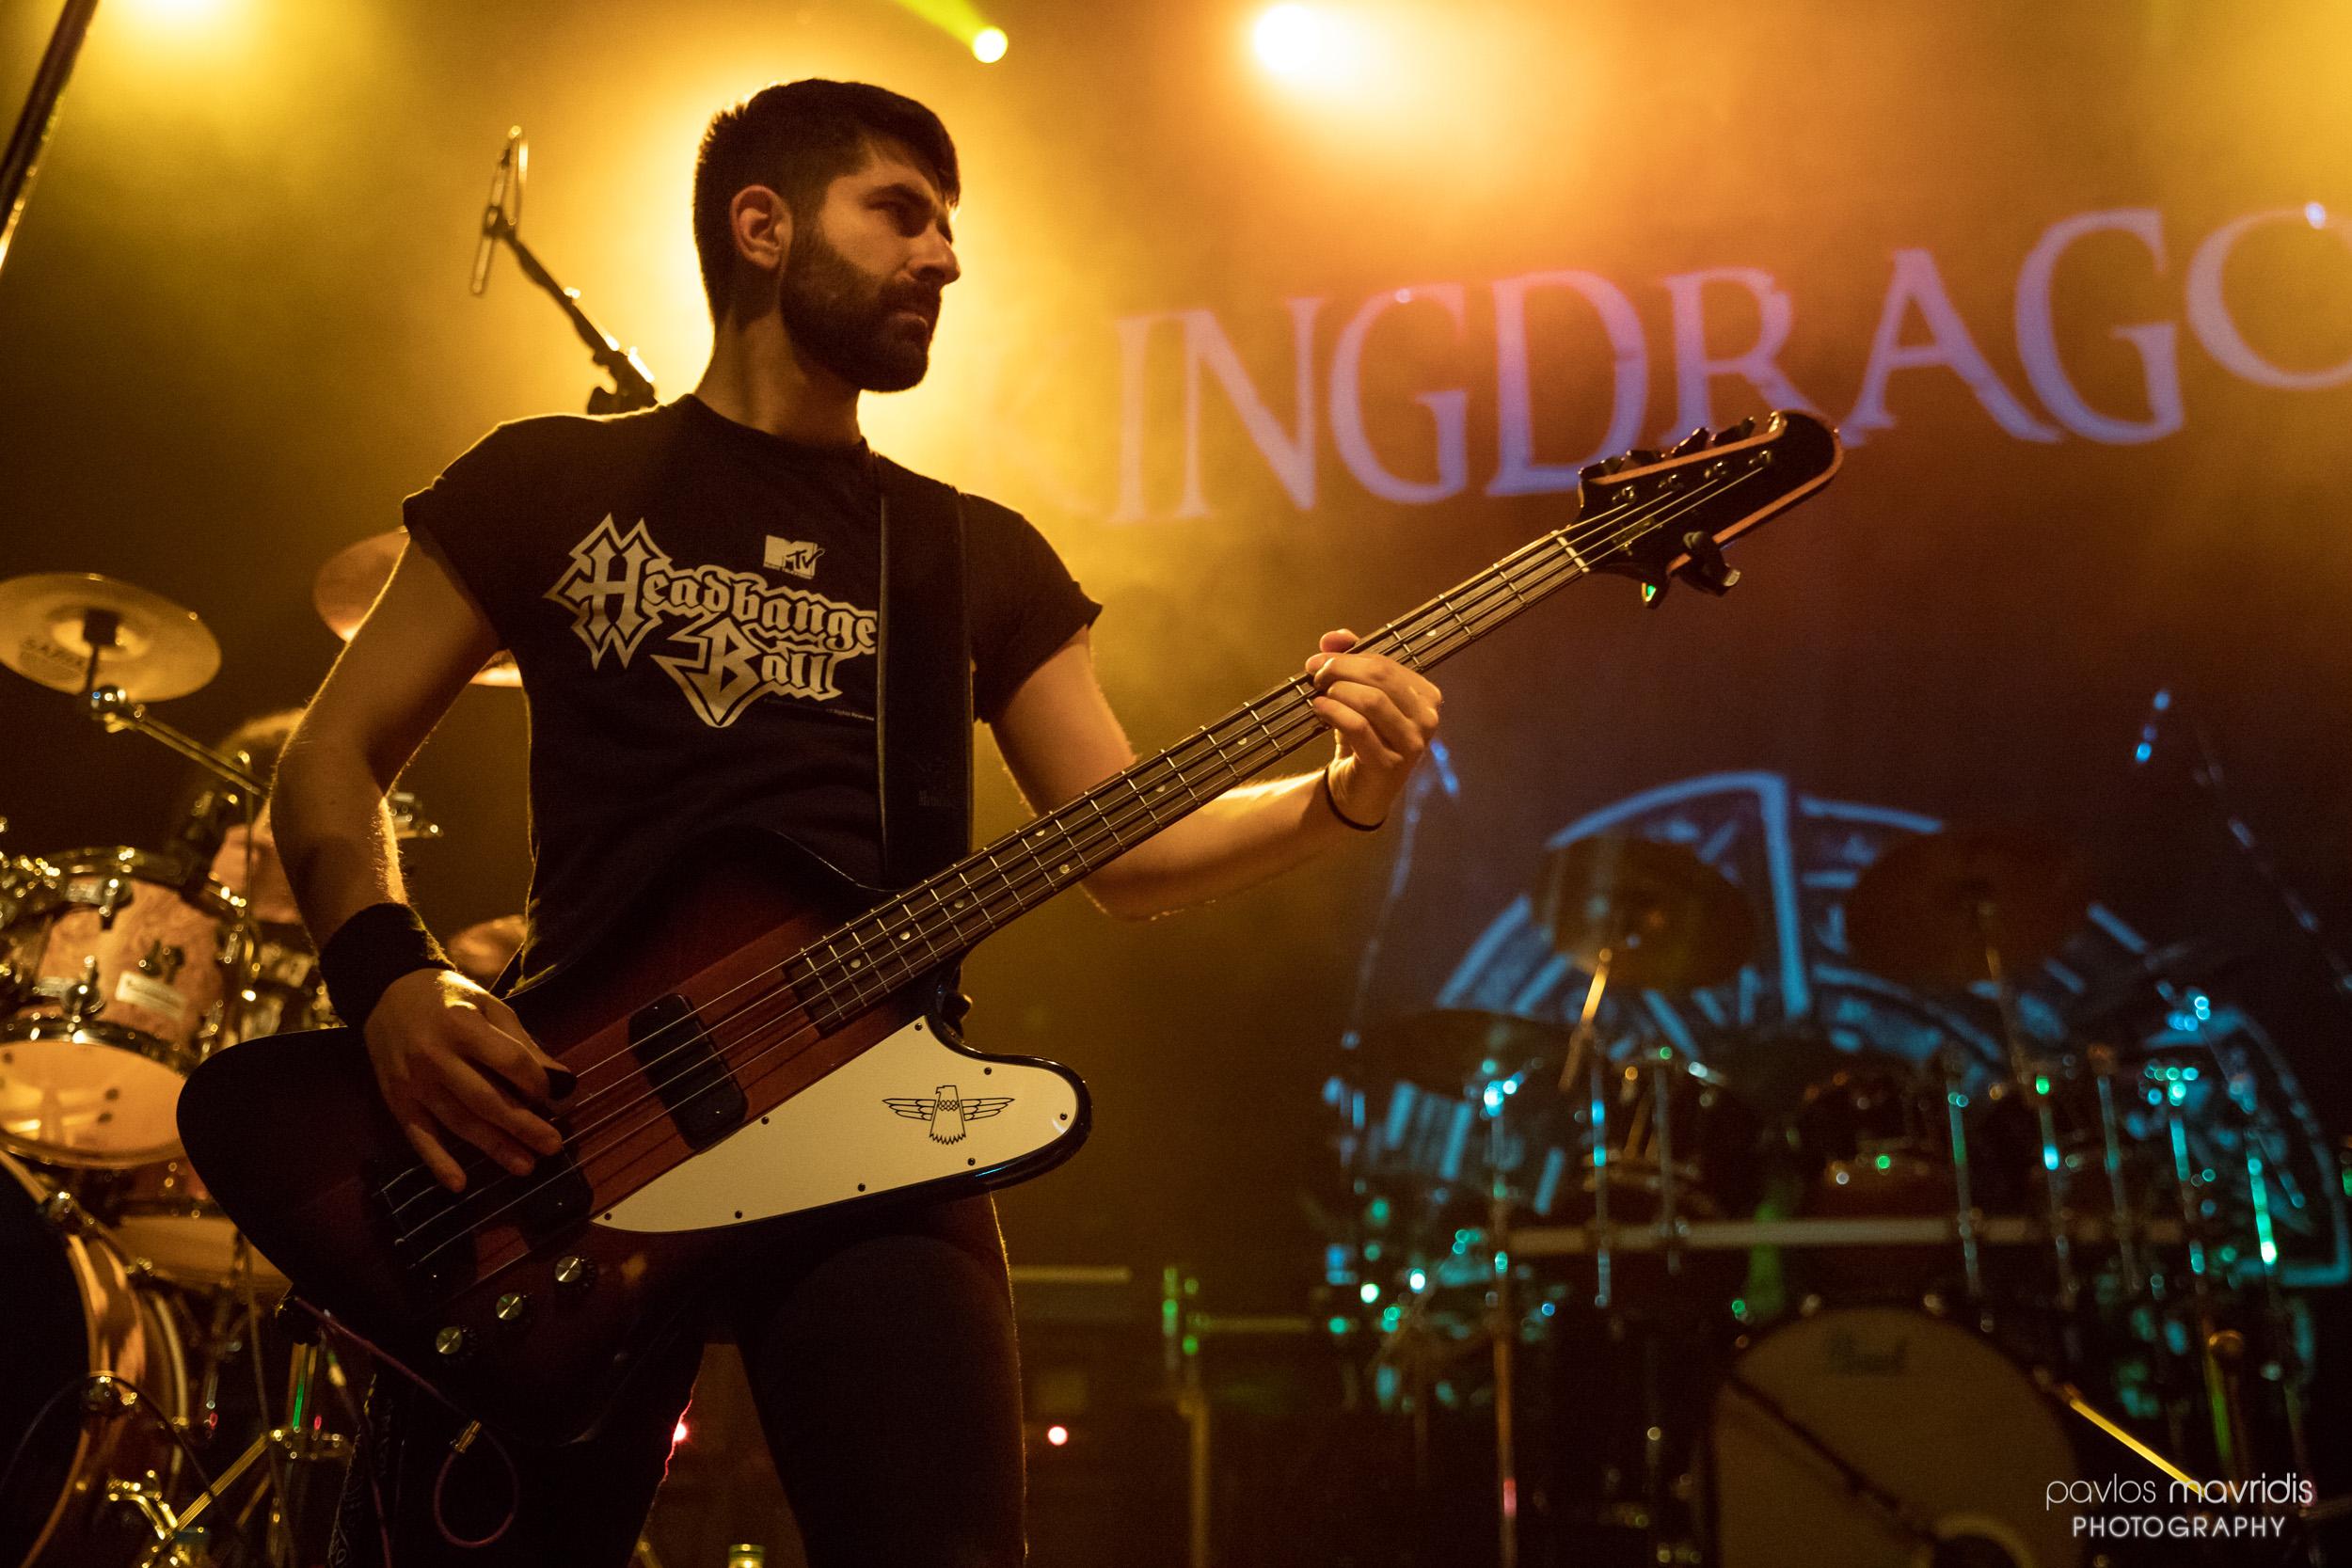 Kingdragon